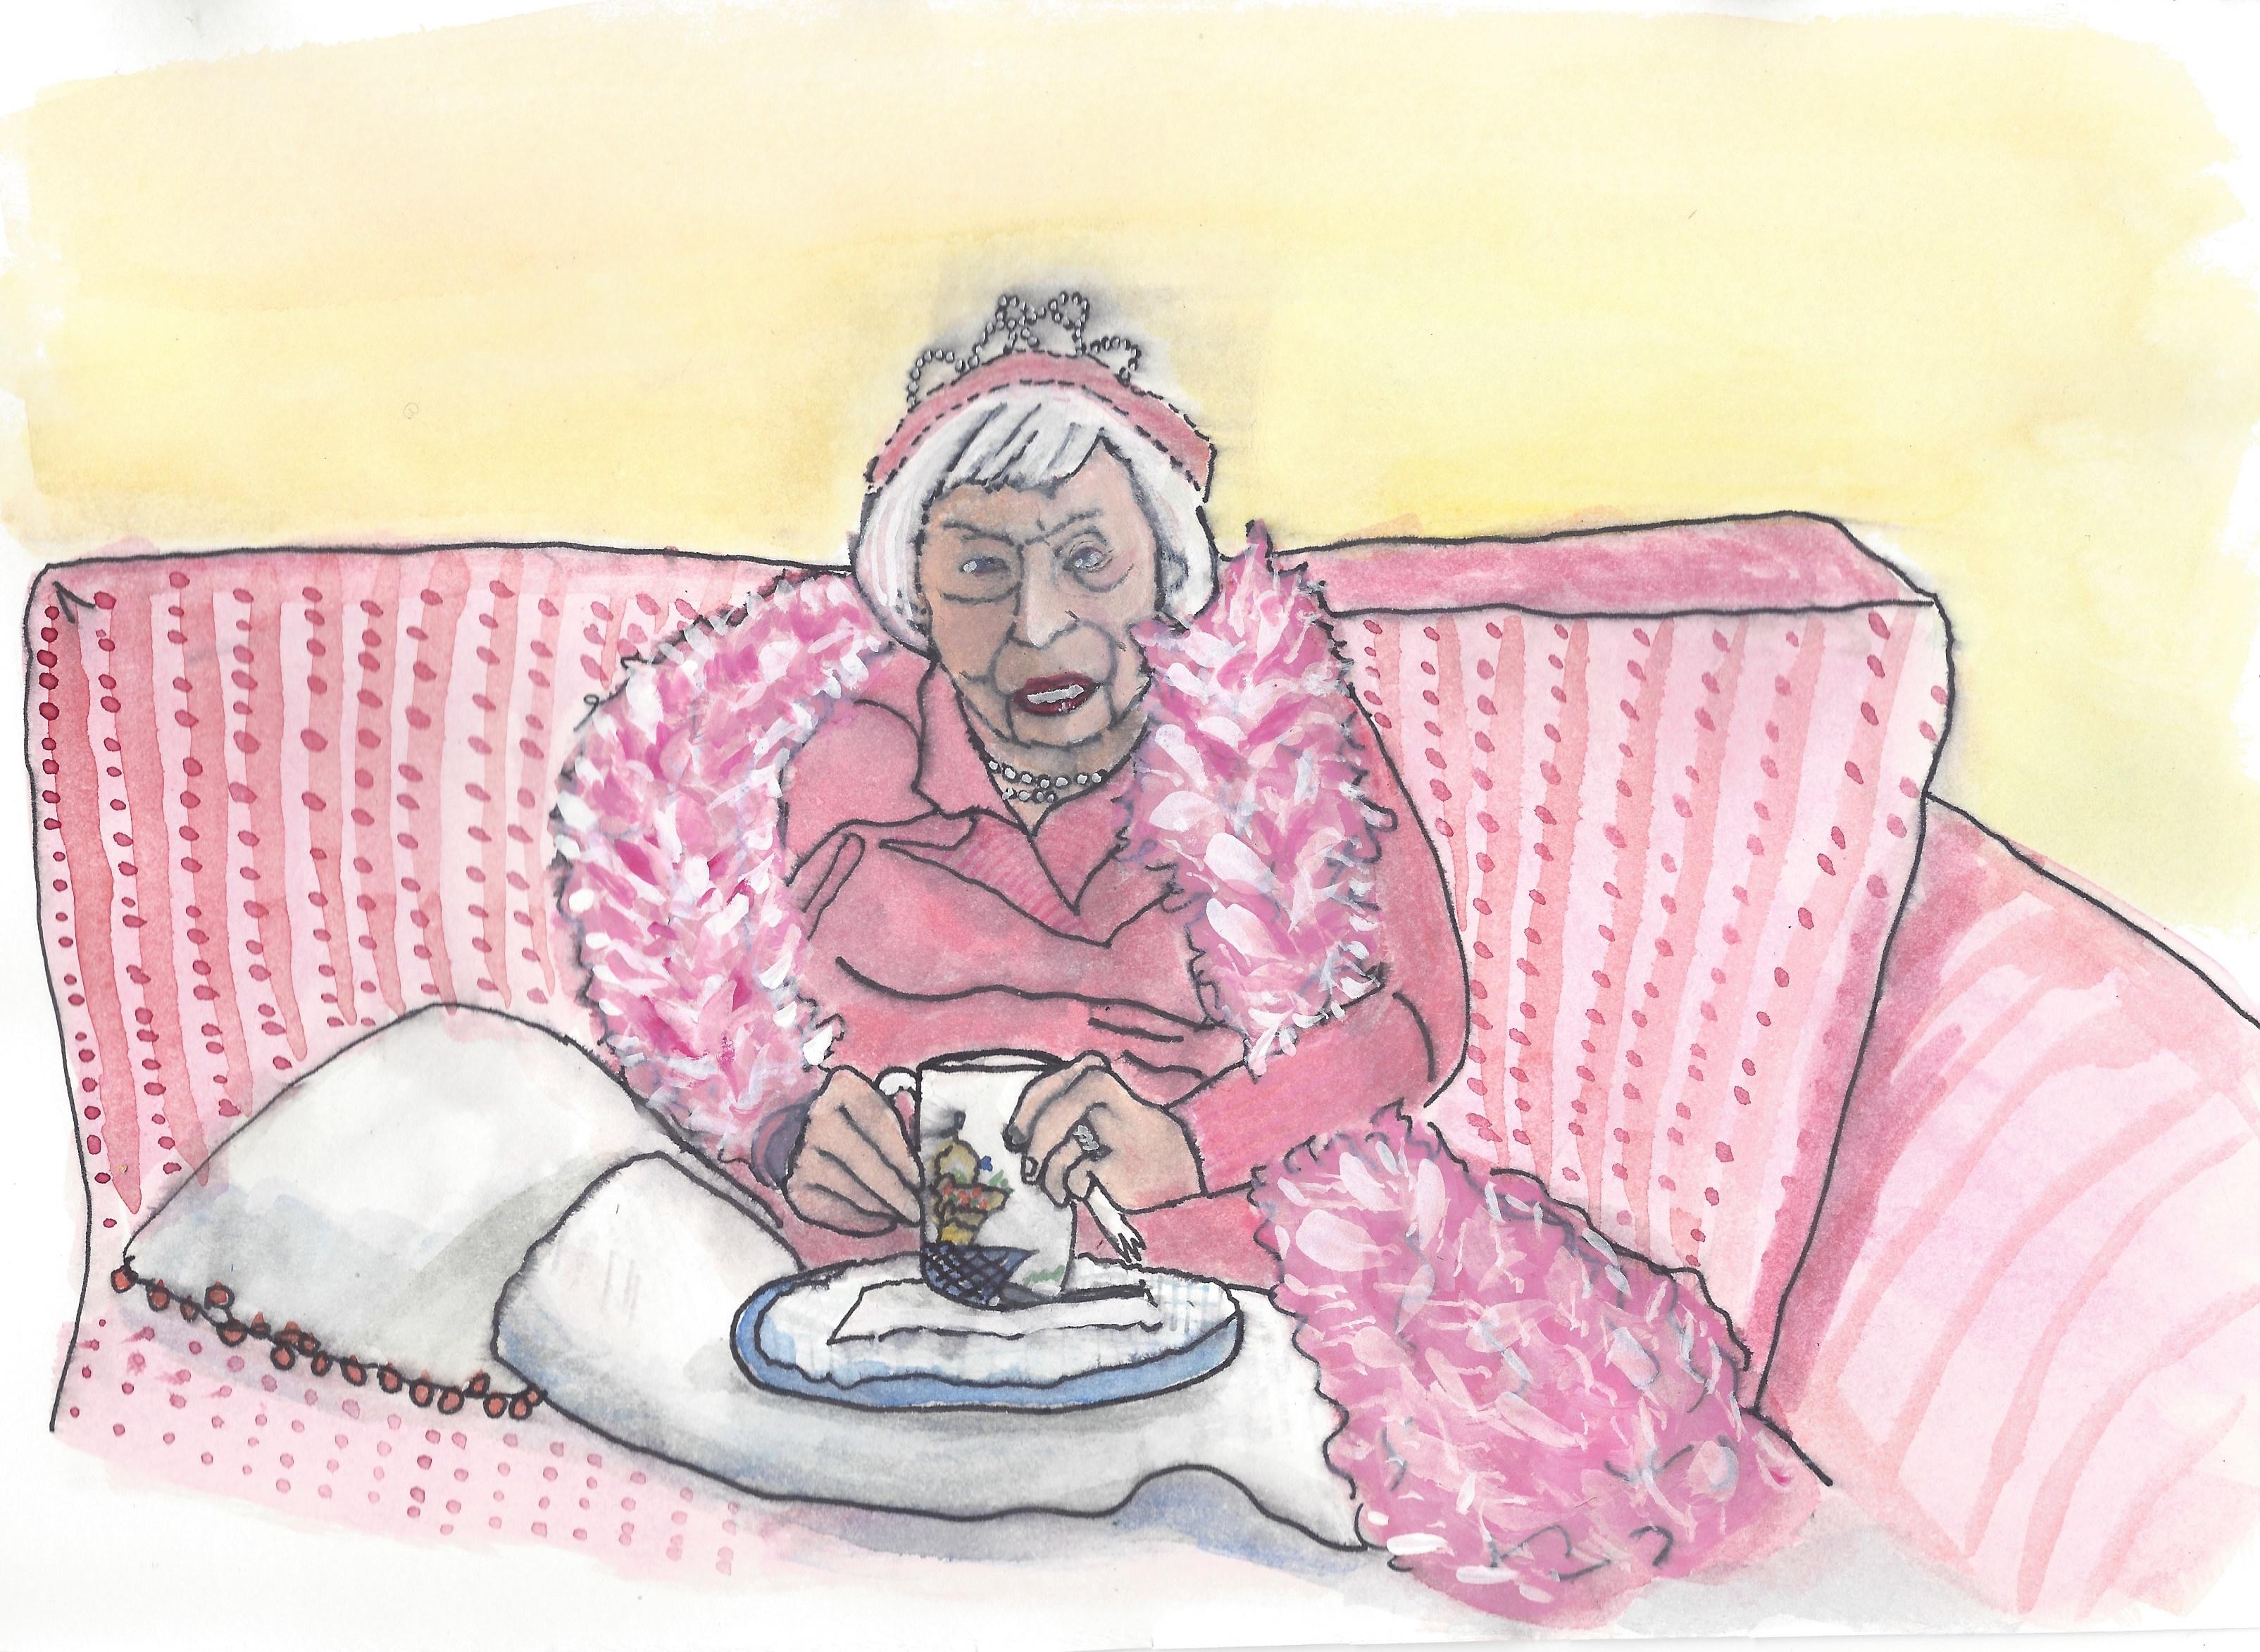 The Pink Birthday Boa